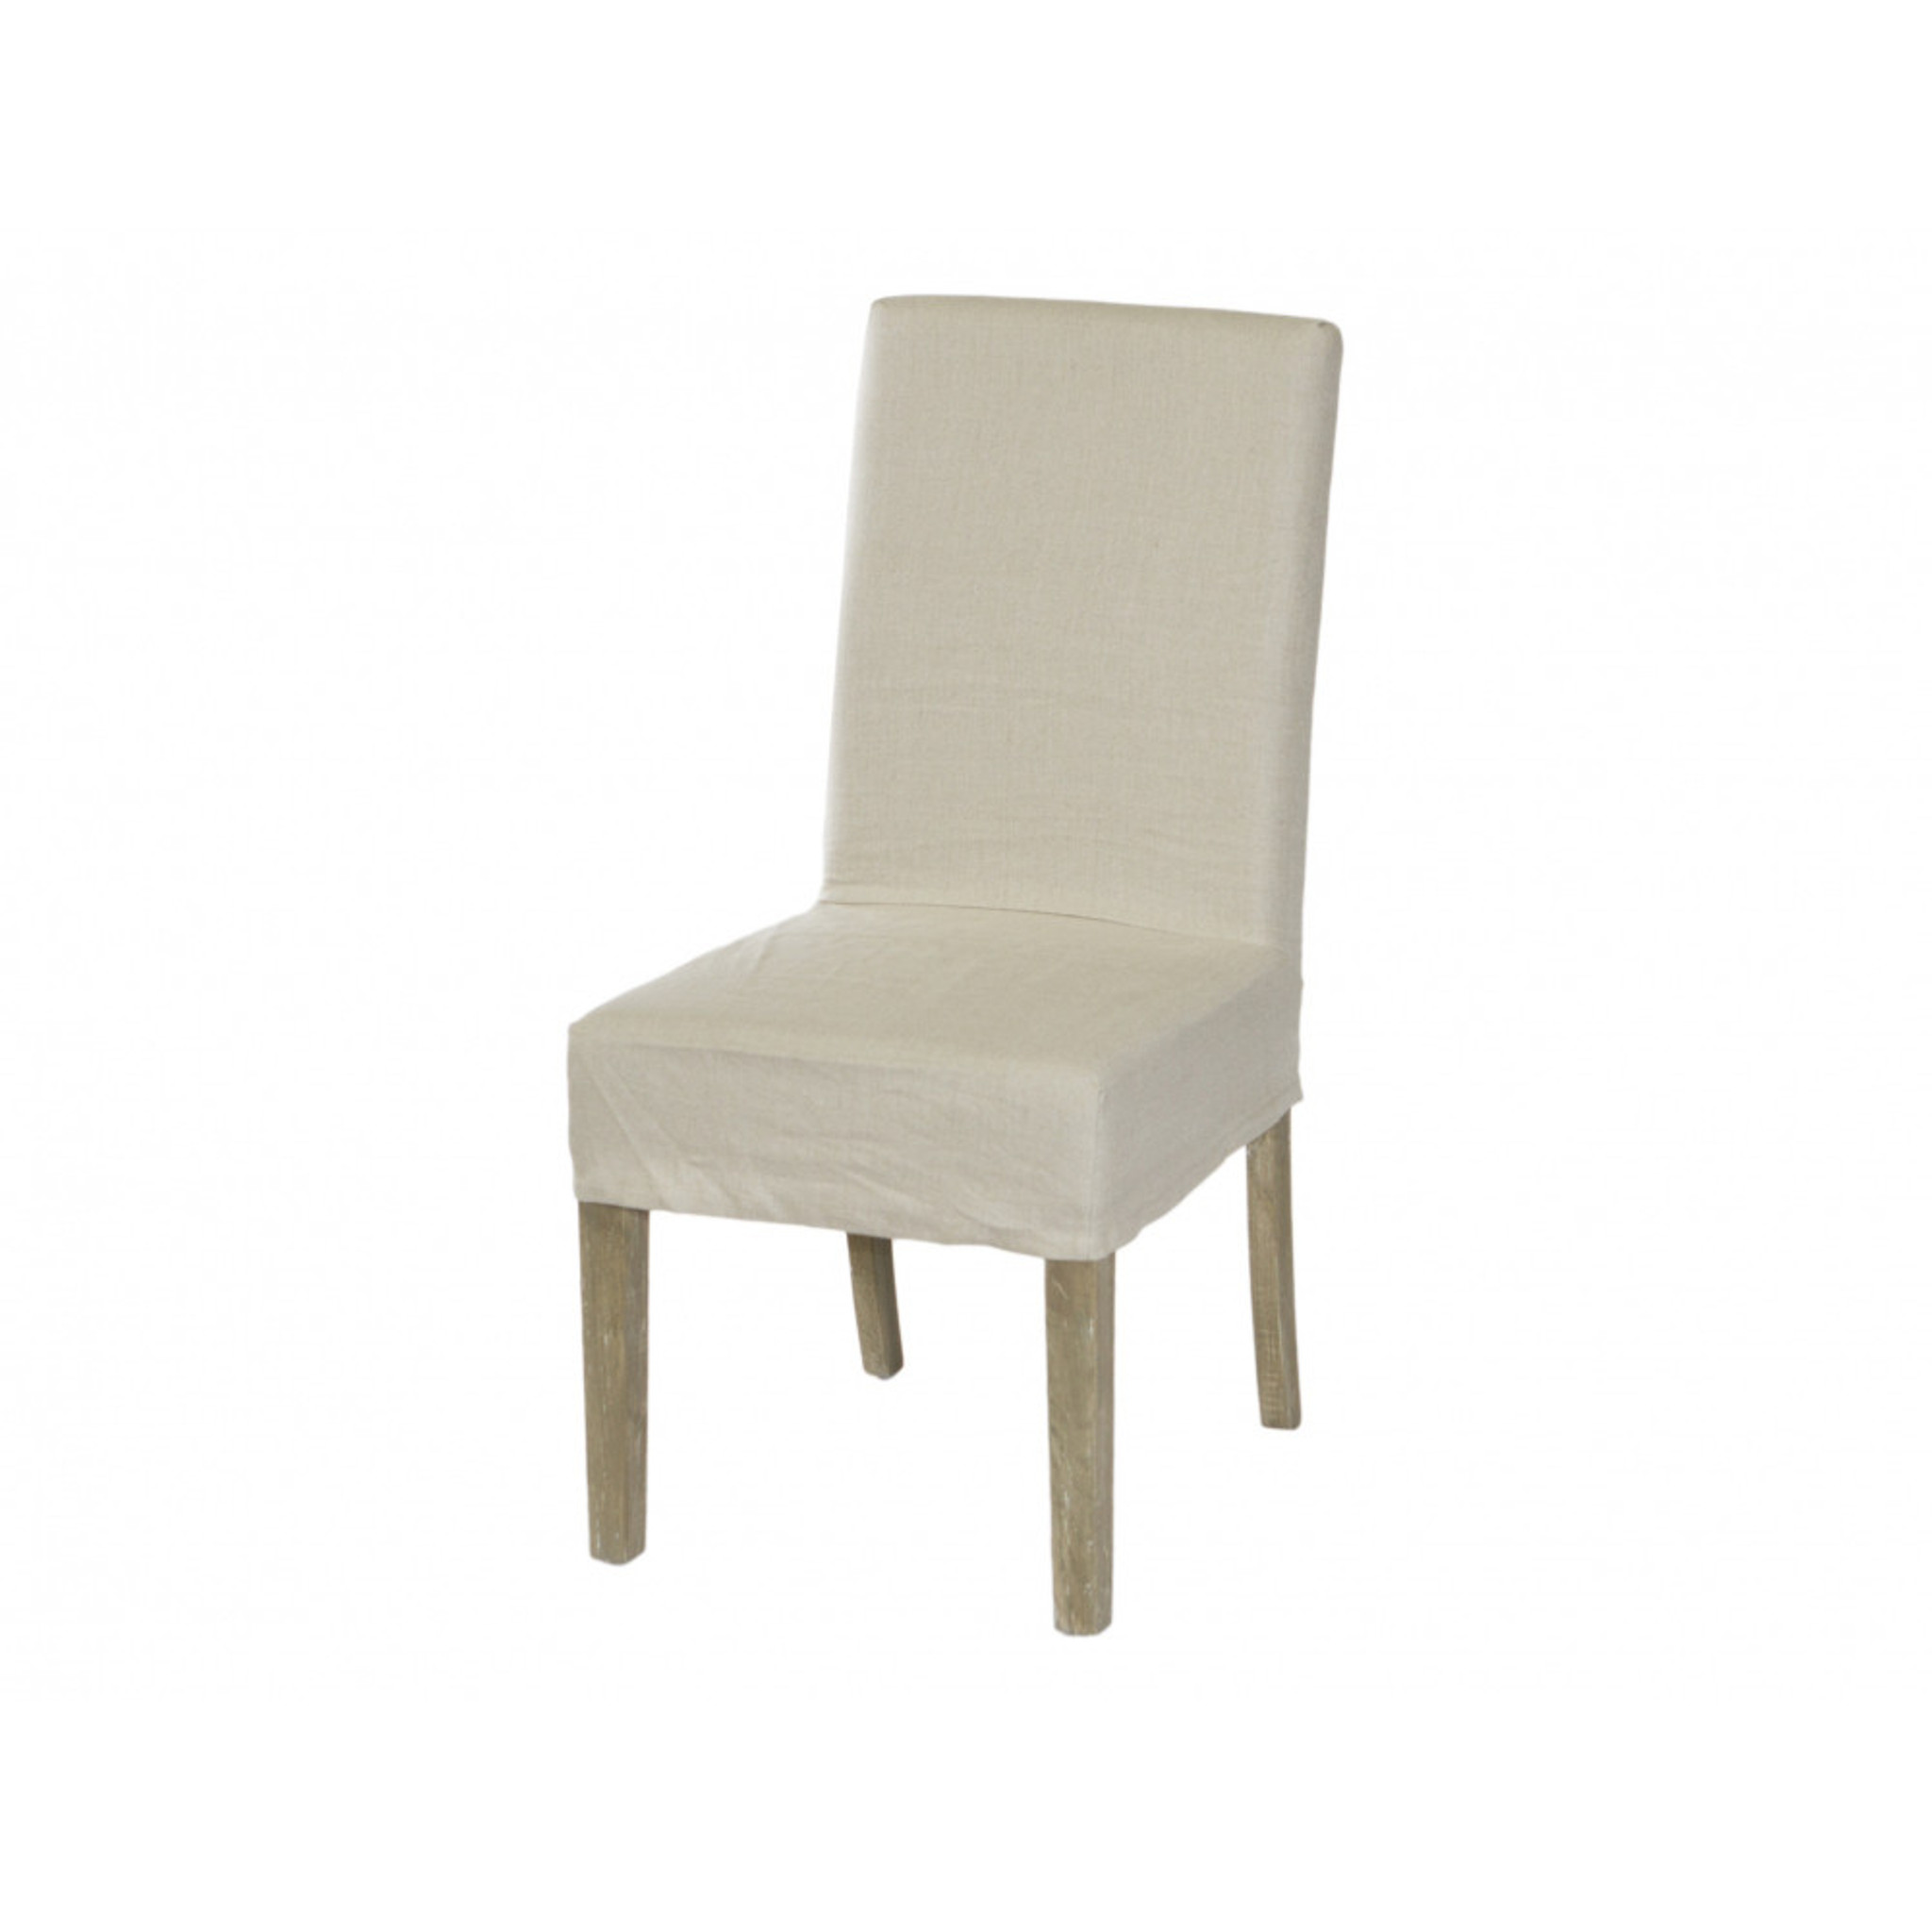 Dining Chair Cover Short Natural Linen Maison Living